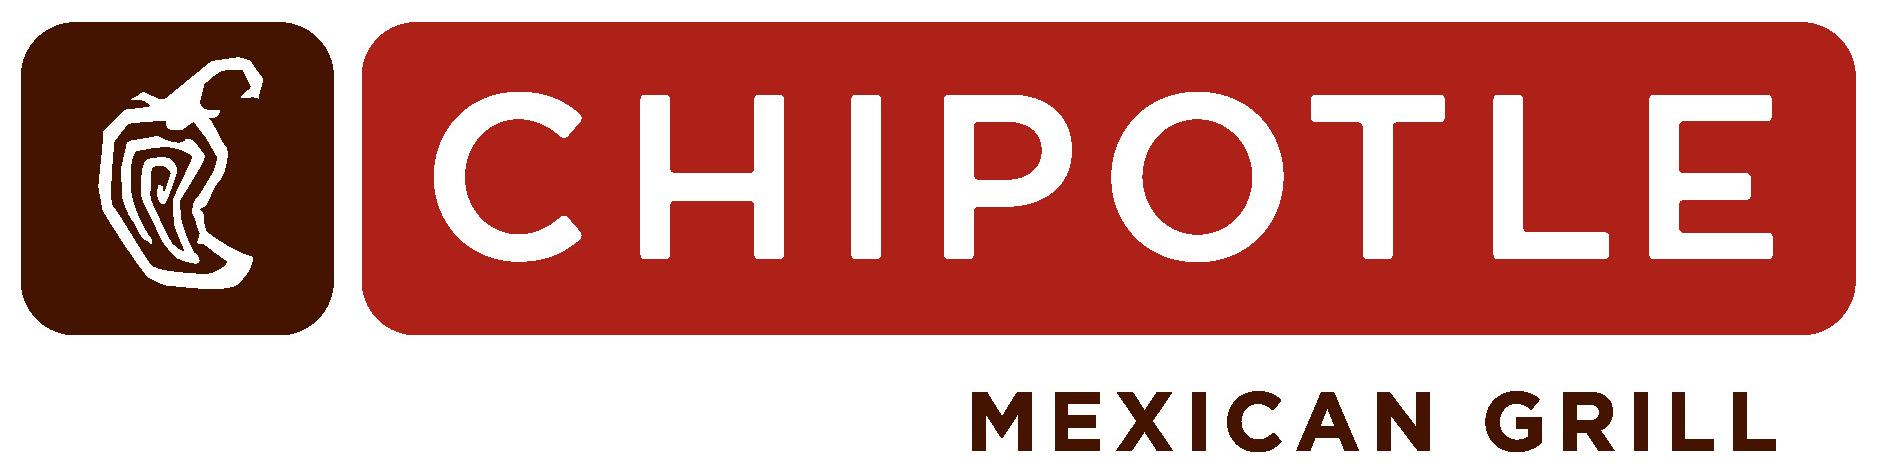 Chipotle-logo-horizontal.jpg